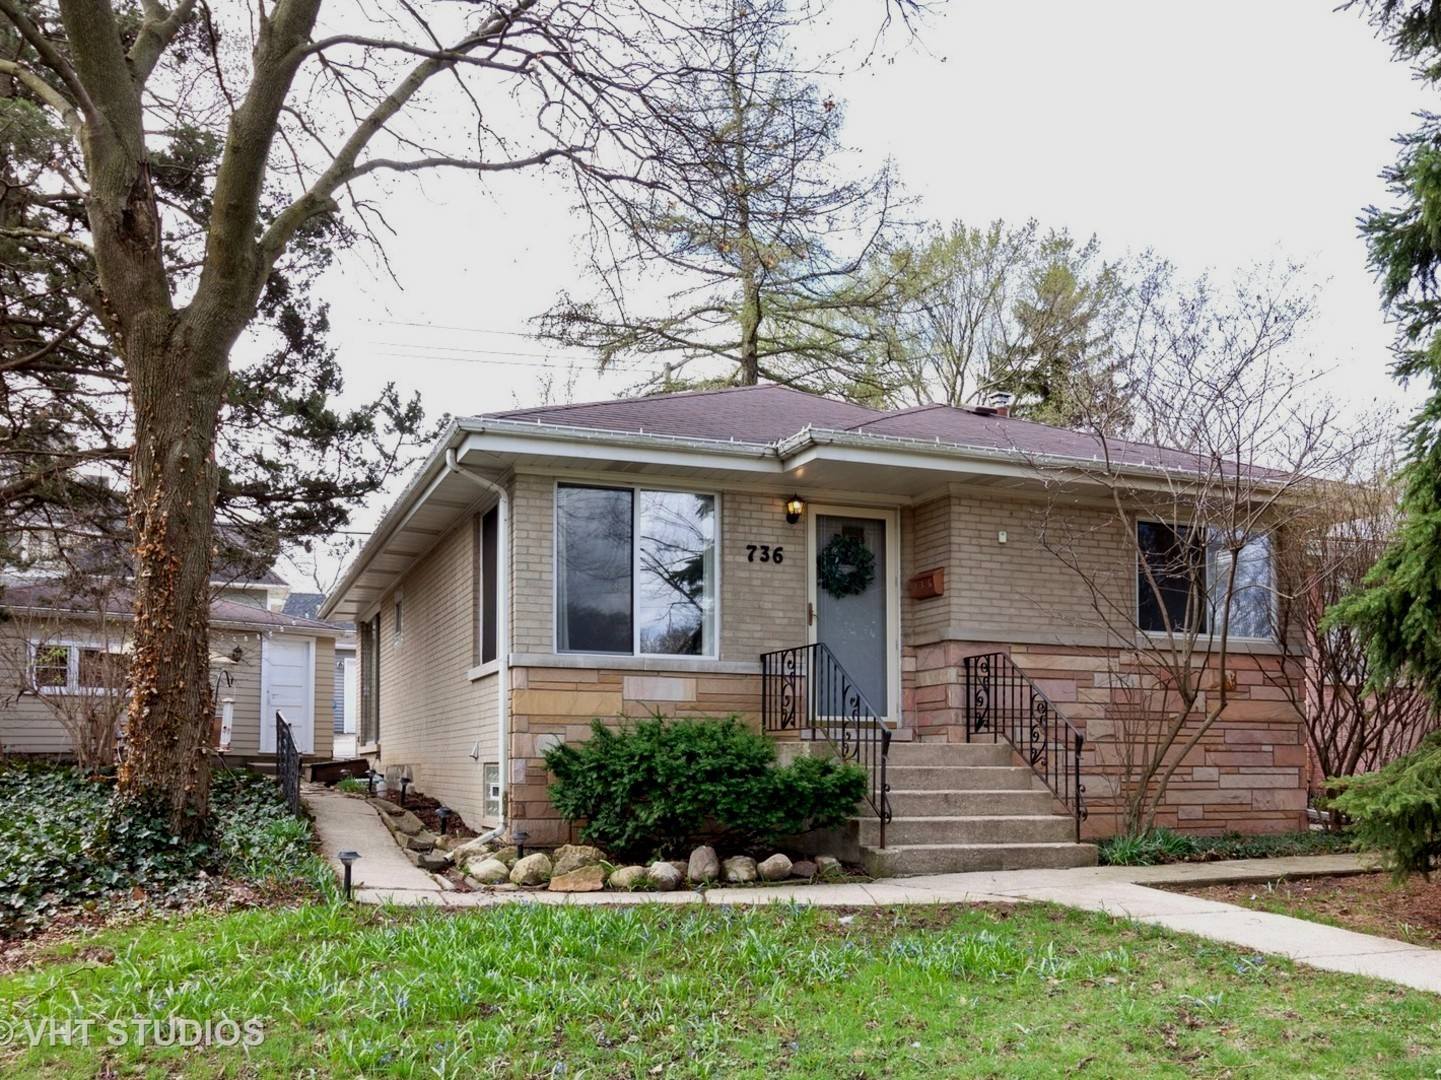 736 West Hinsdale Avenue, Hinsdale, Illinois 60521